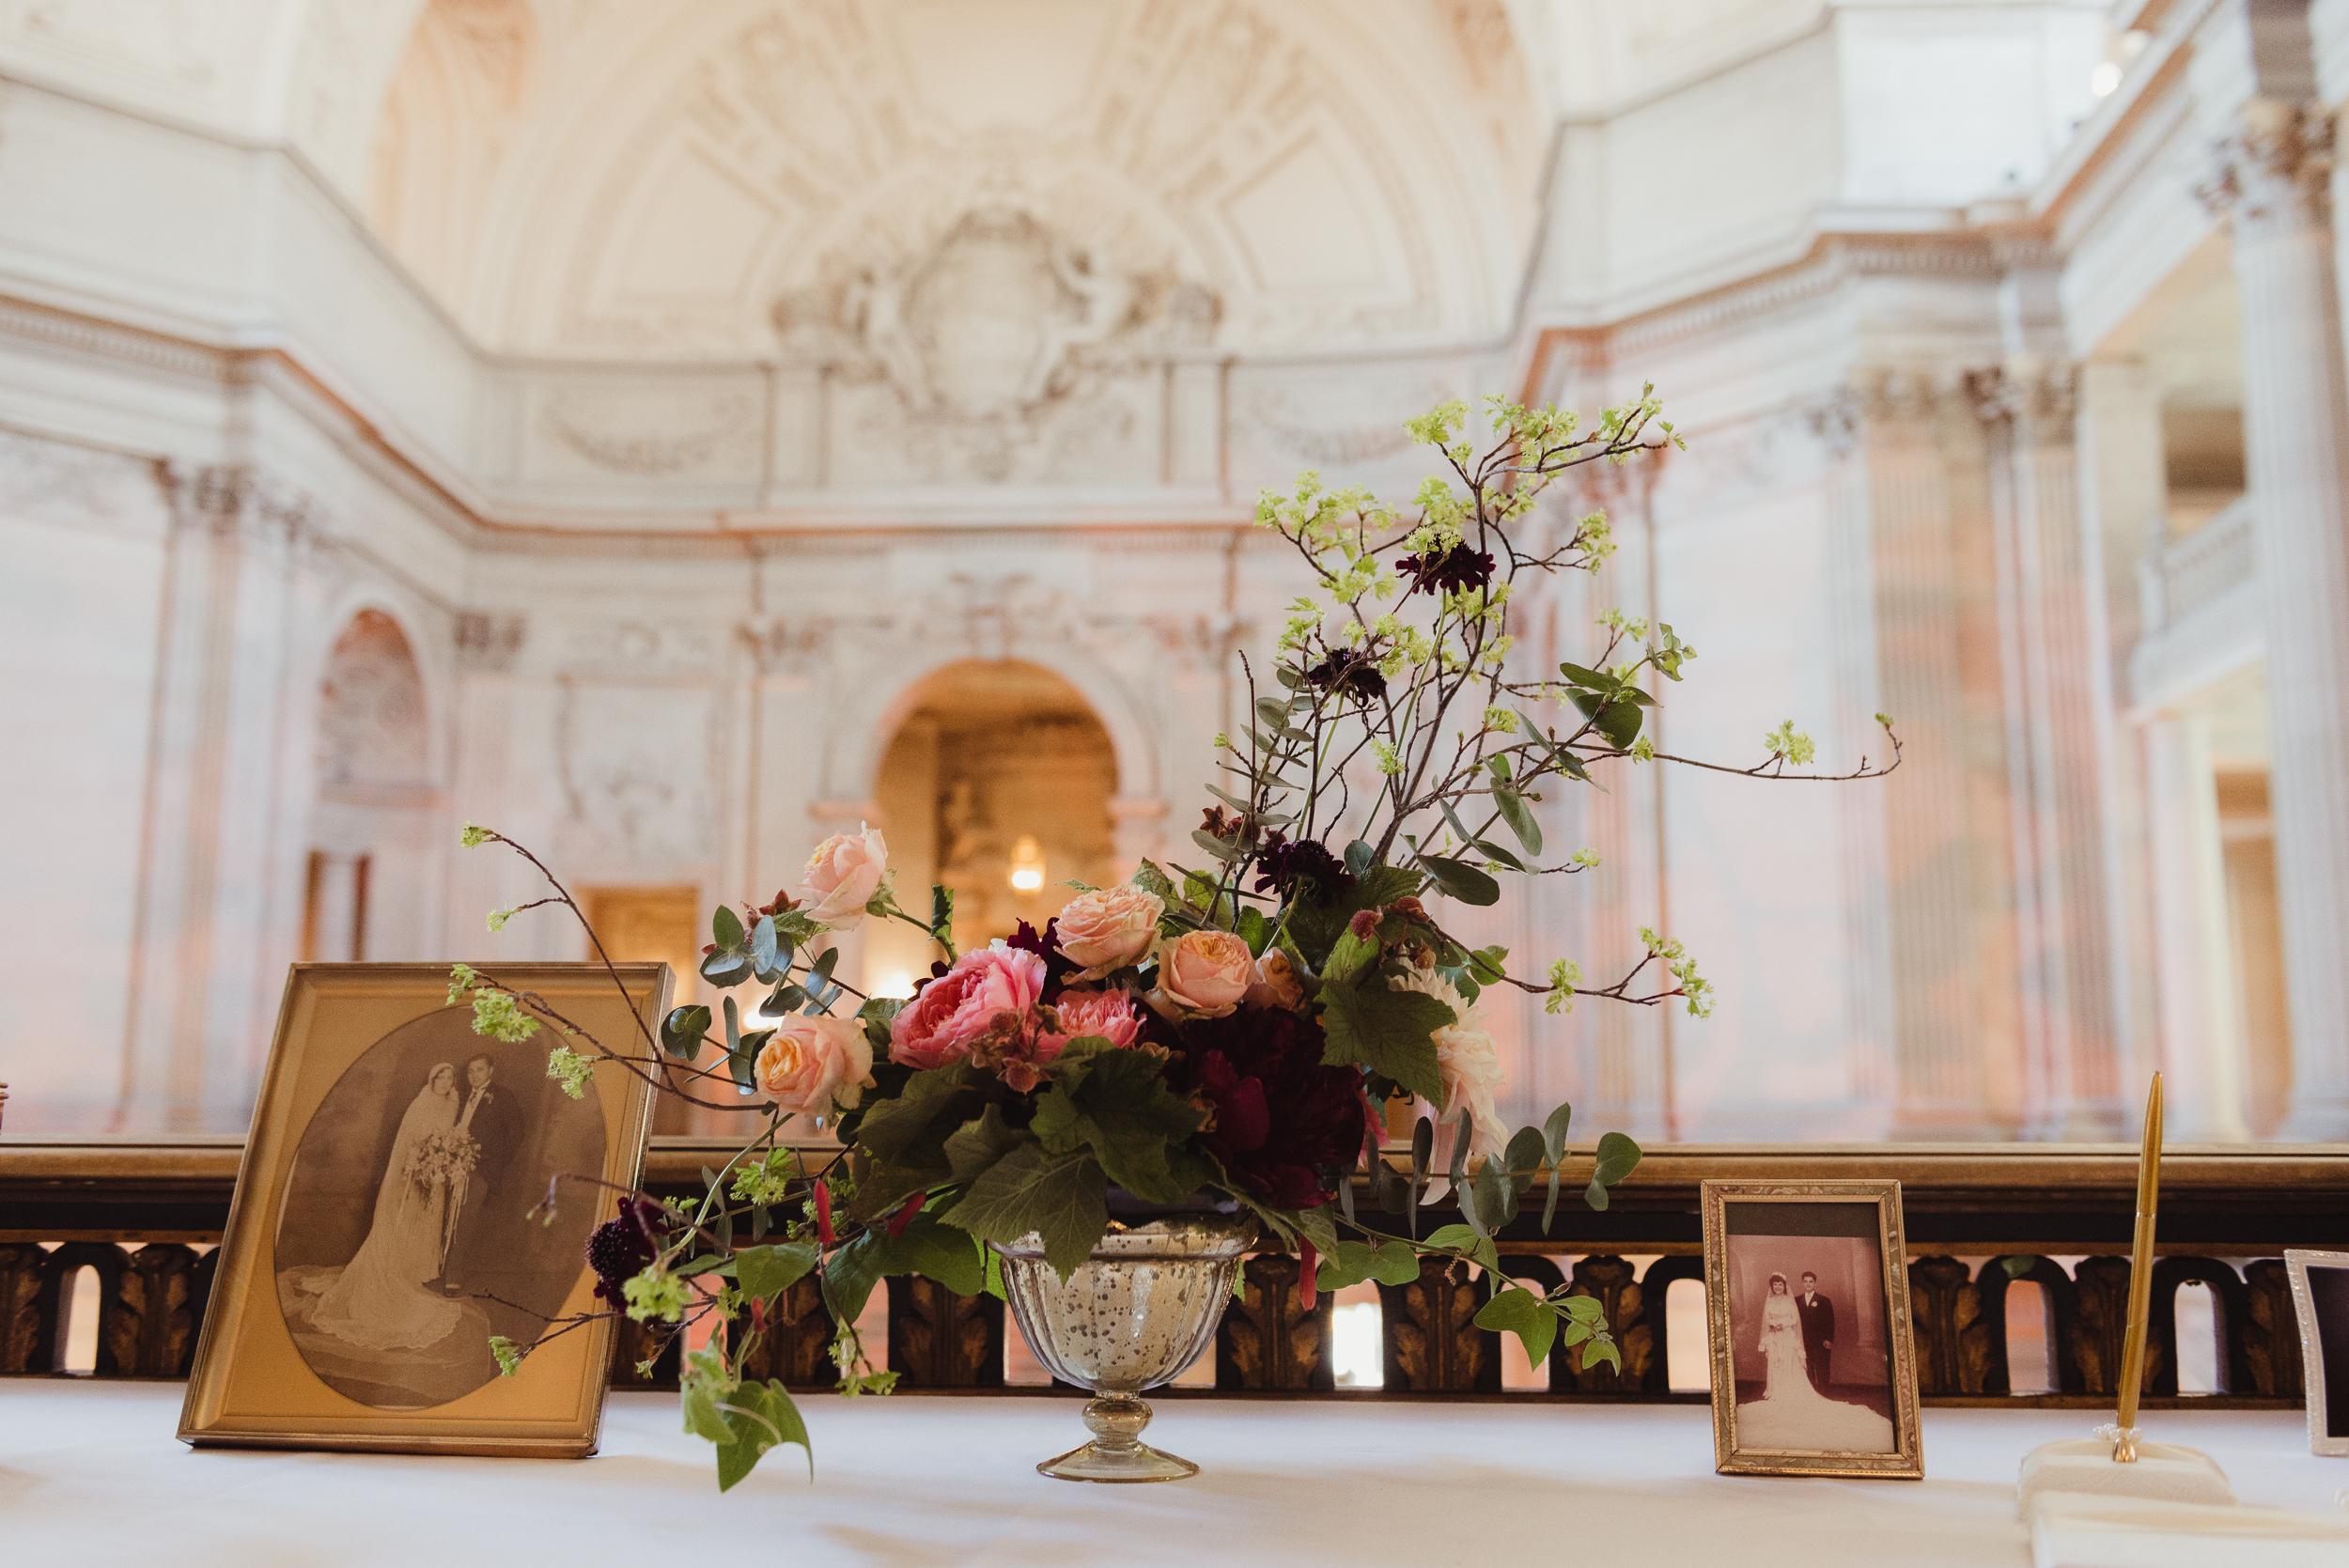 54-elegant-san-francisco-city-hall-wedding-vivianchen-0049.jpg